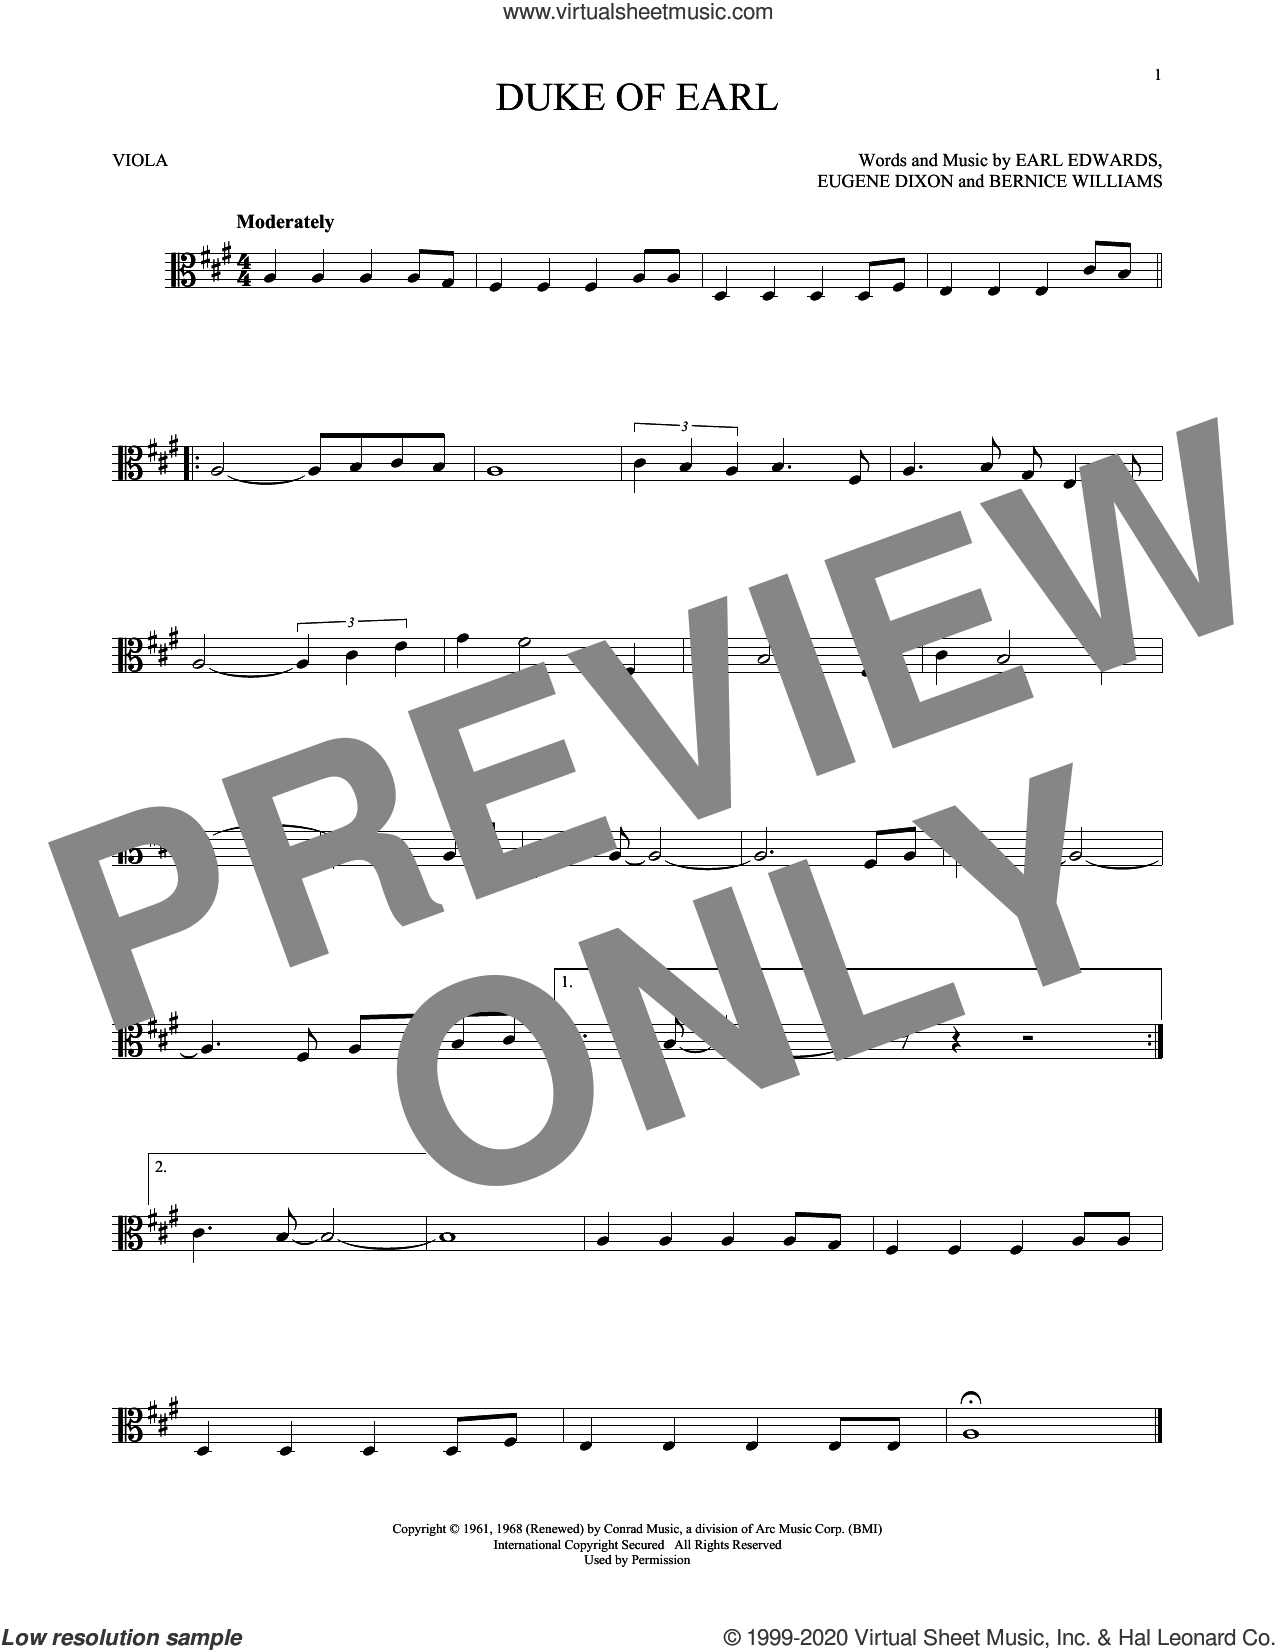 Duke Of Earl sheet music for viola solo by Gene Chandler, Bernice Williams, Earl Edwards and Eugene Dixon, intermediate skill level